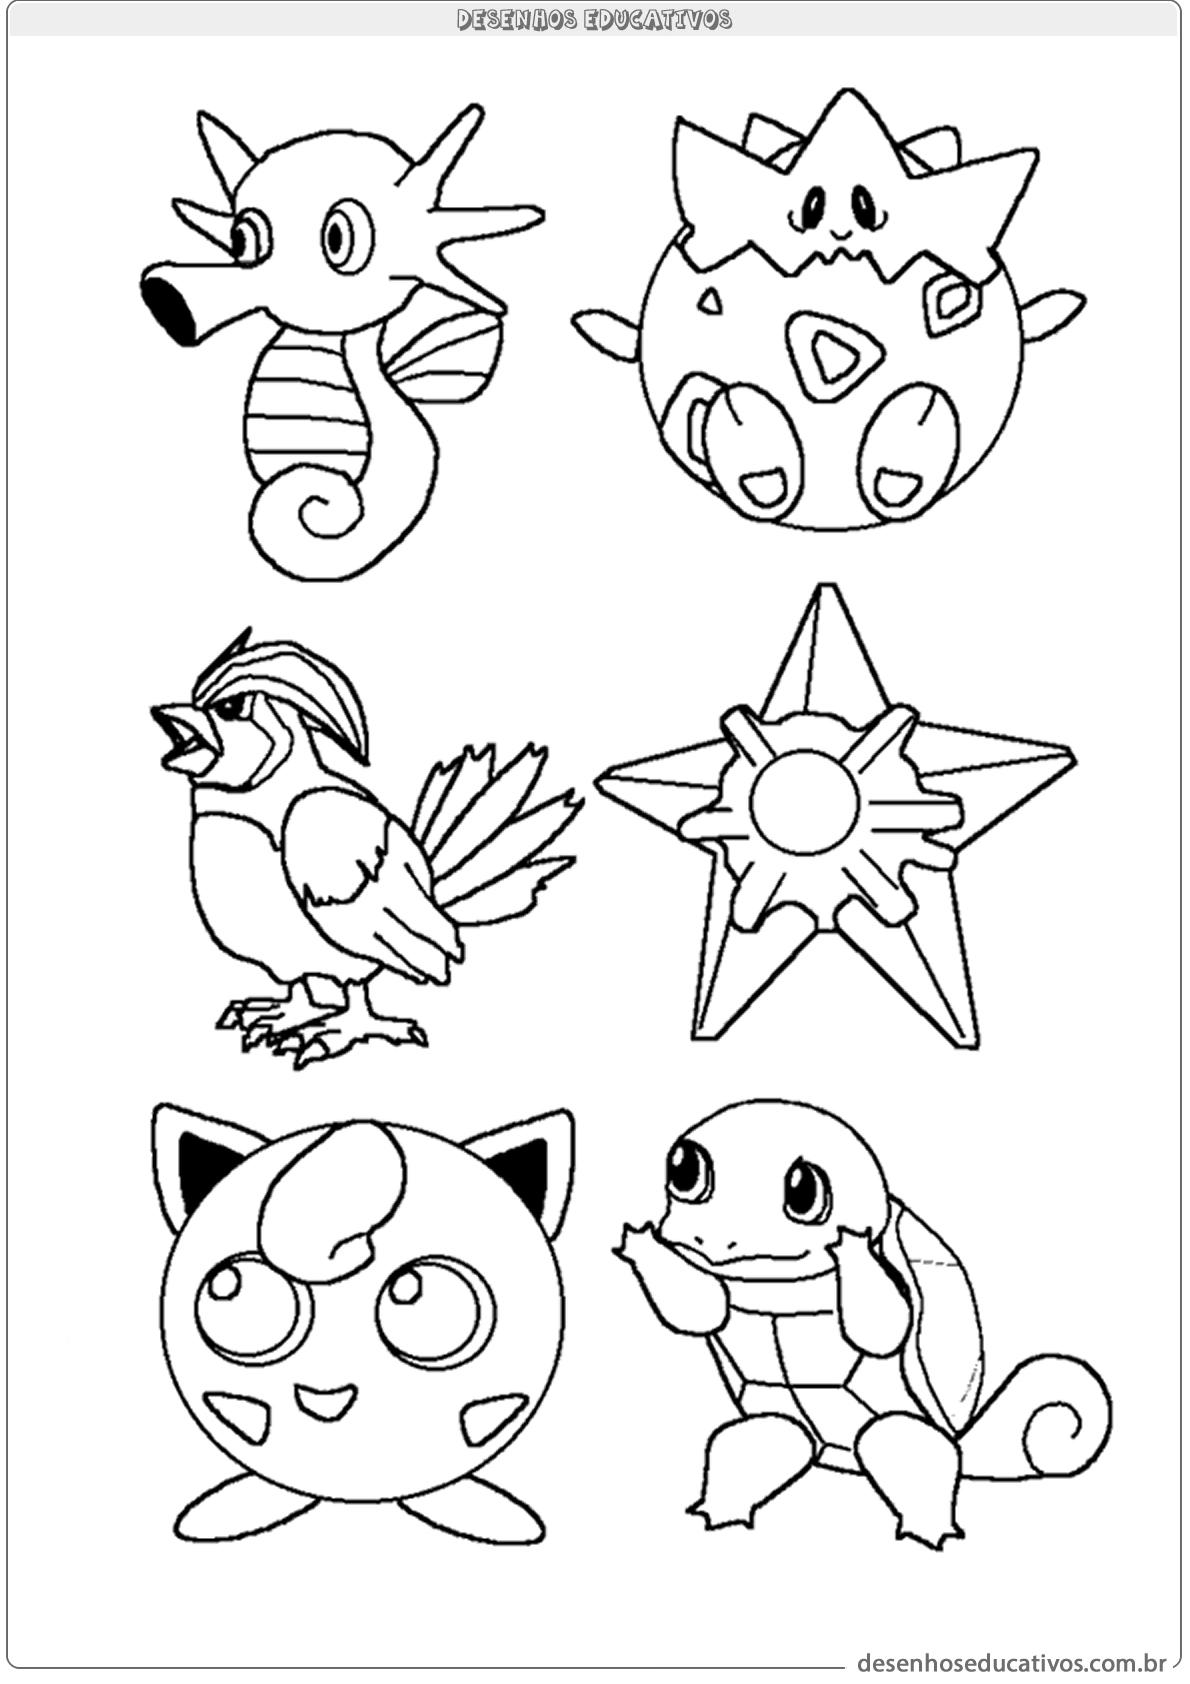 Colorir pokemons